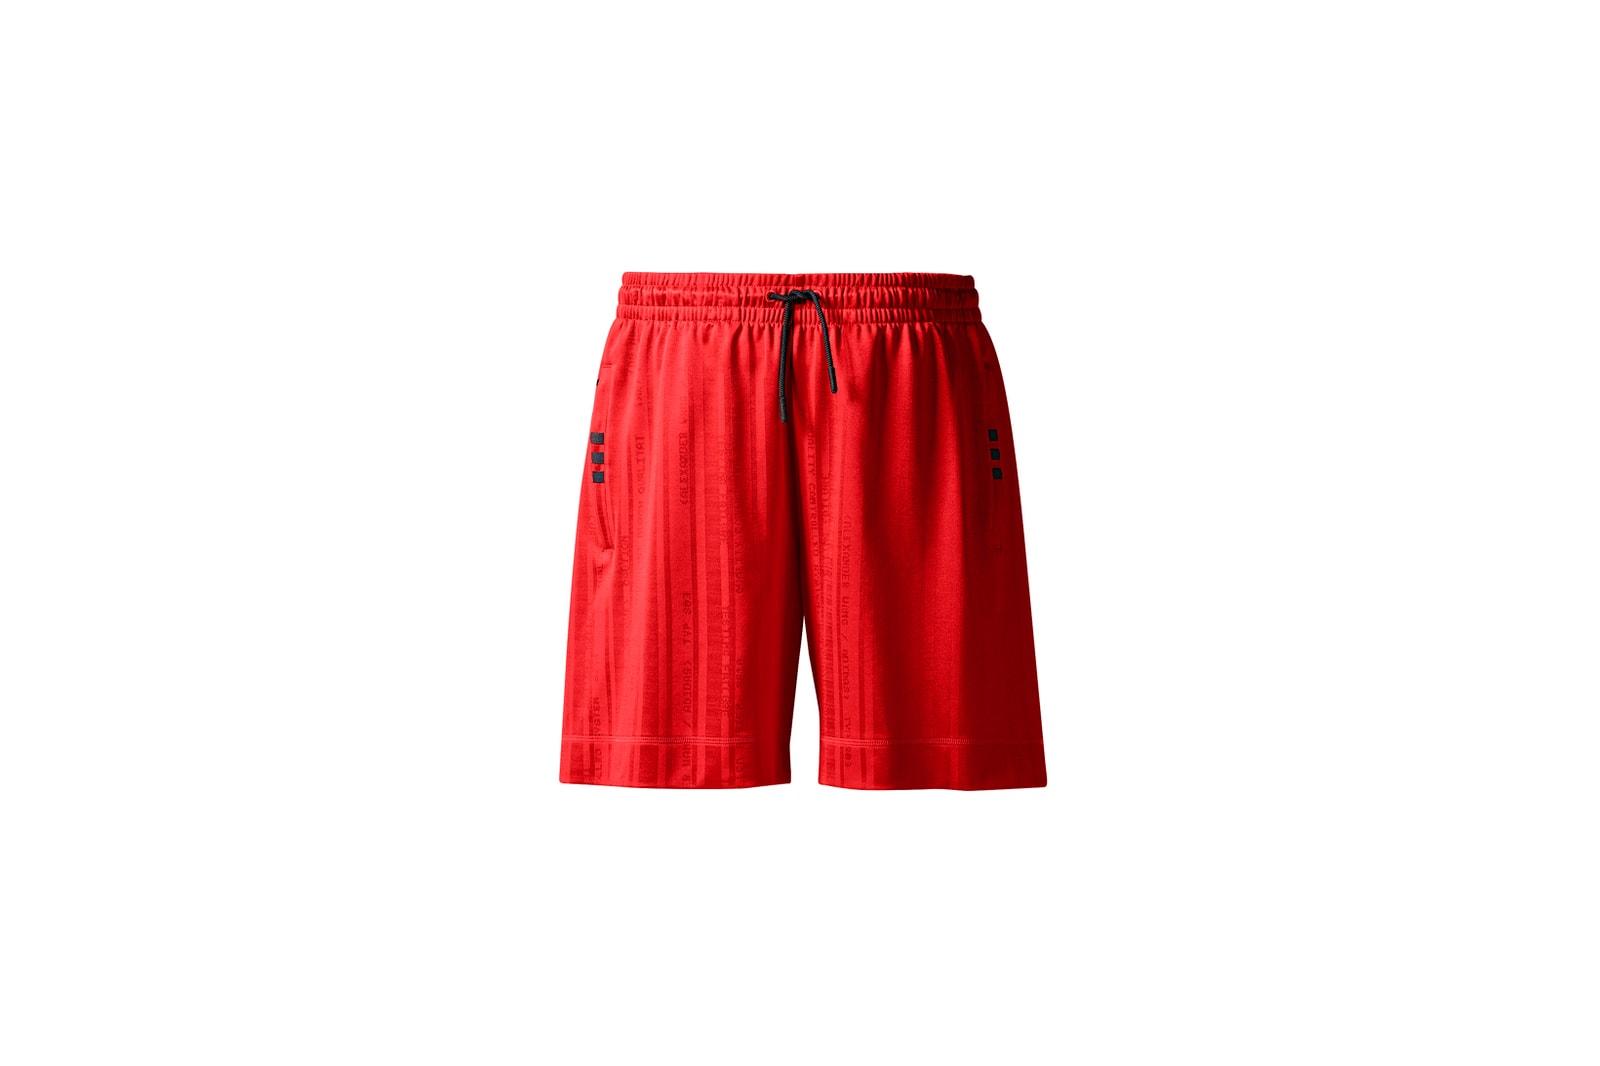 alexander wang adidas originals season 3 drop 2 wangsquad lexi boling binx walton